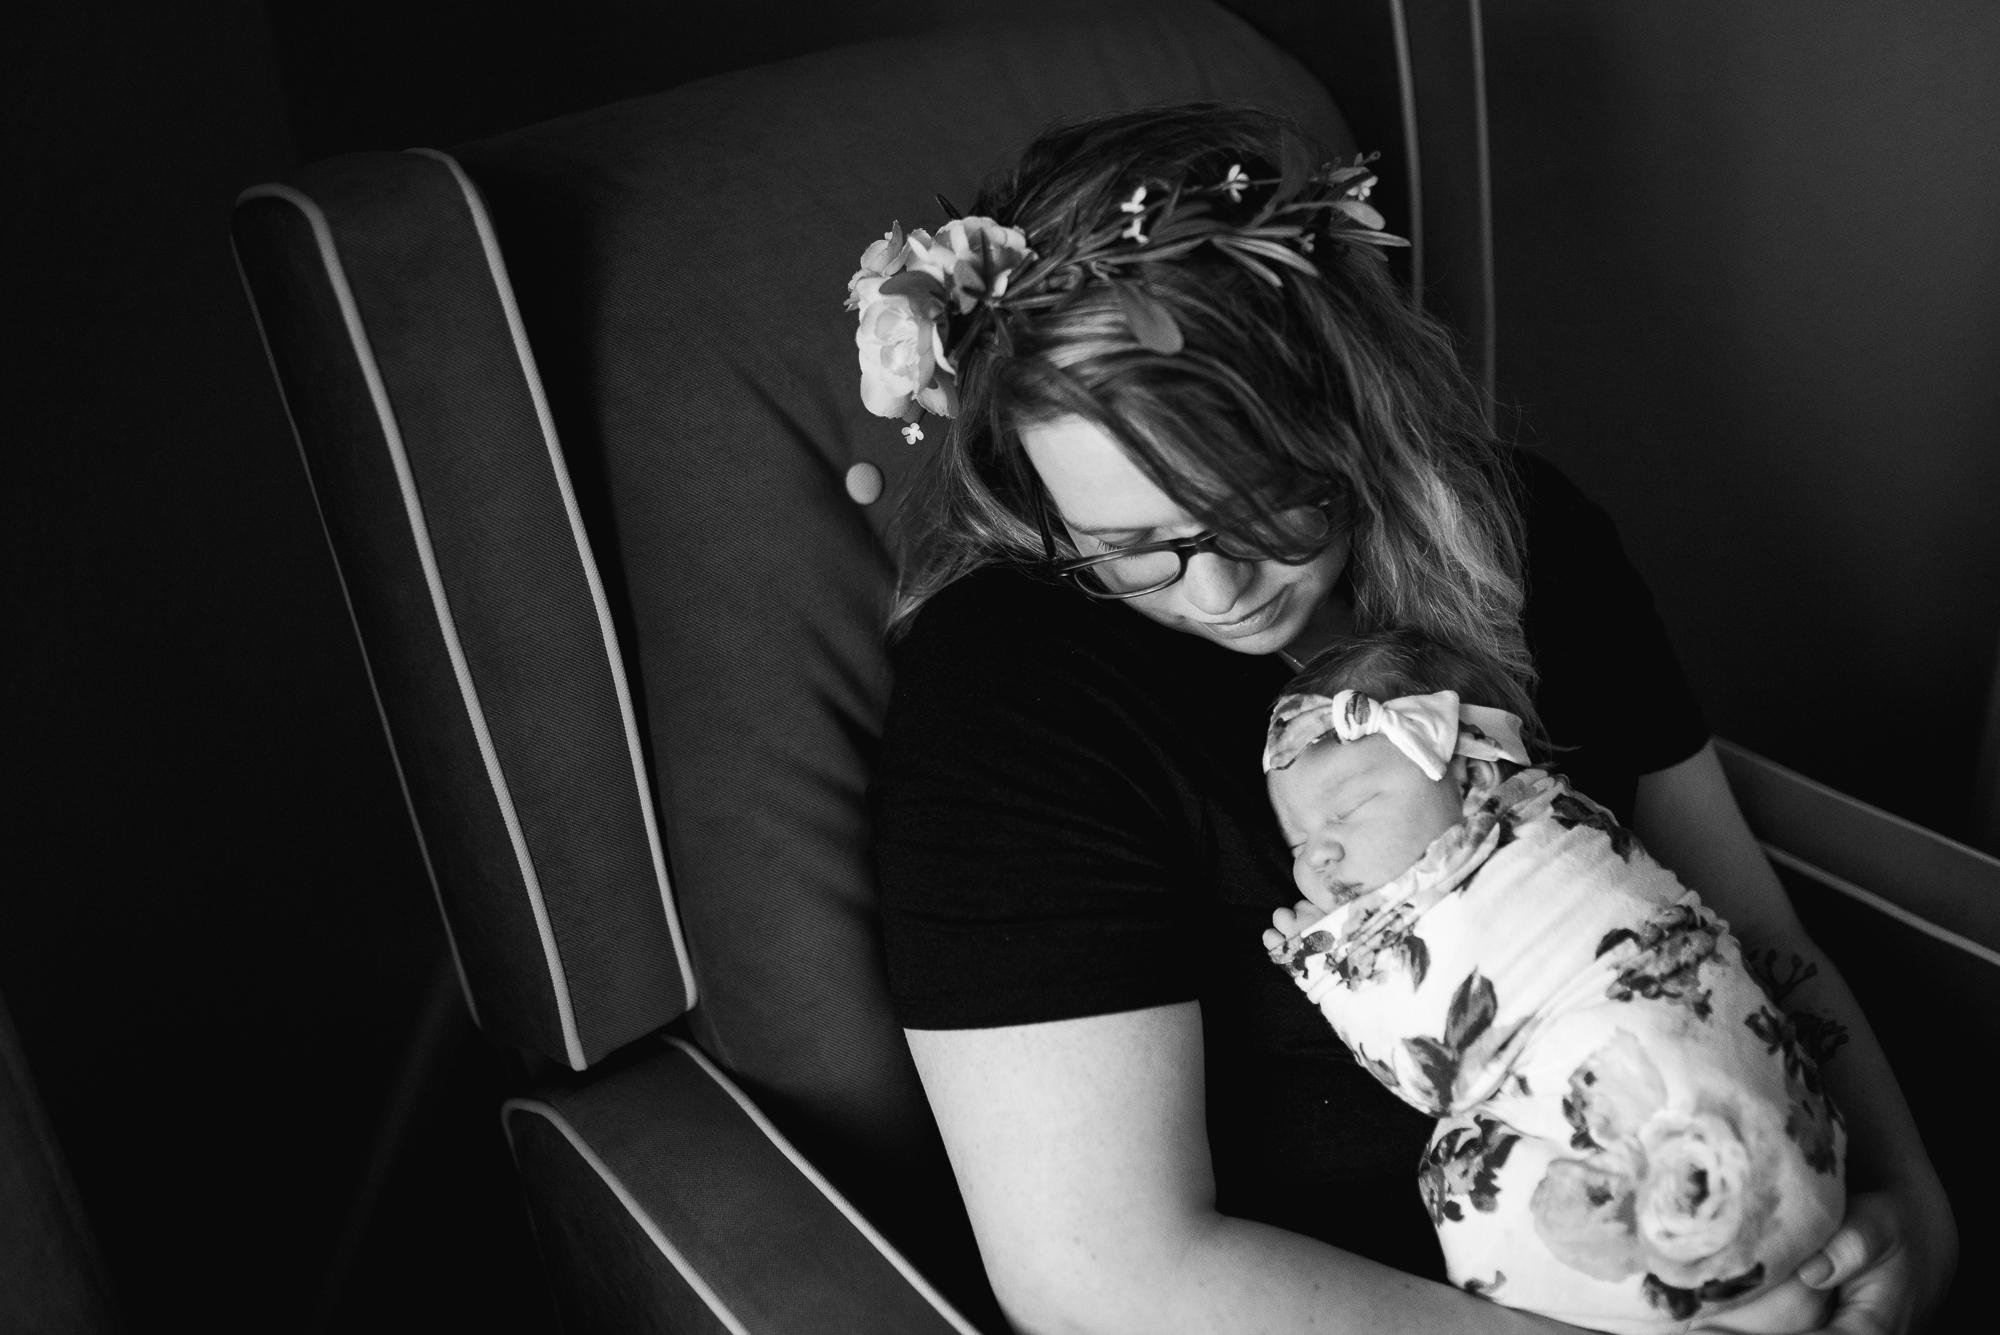 Denver+Boulder+Fresh48+Newborn+Photographer+JennyFolmanPhotography-11.jpg